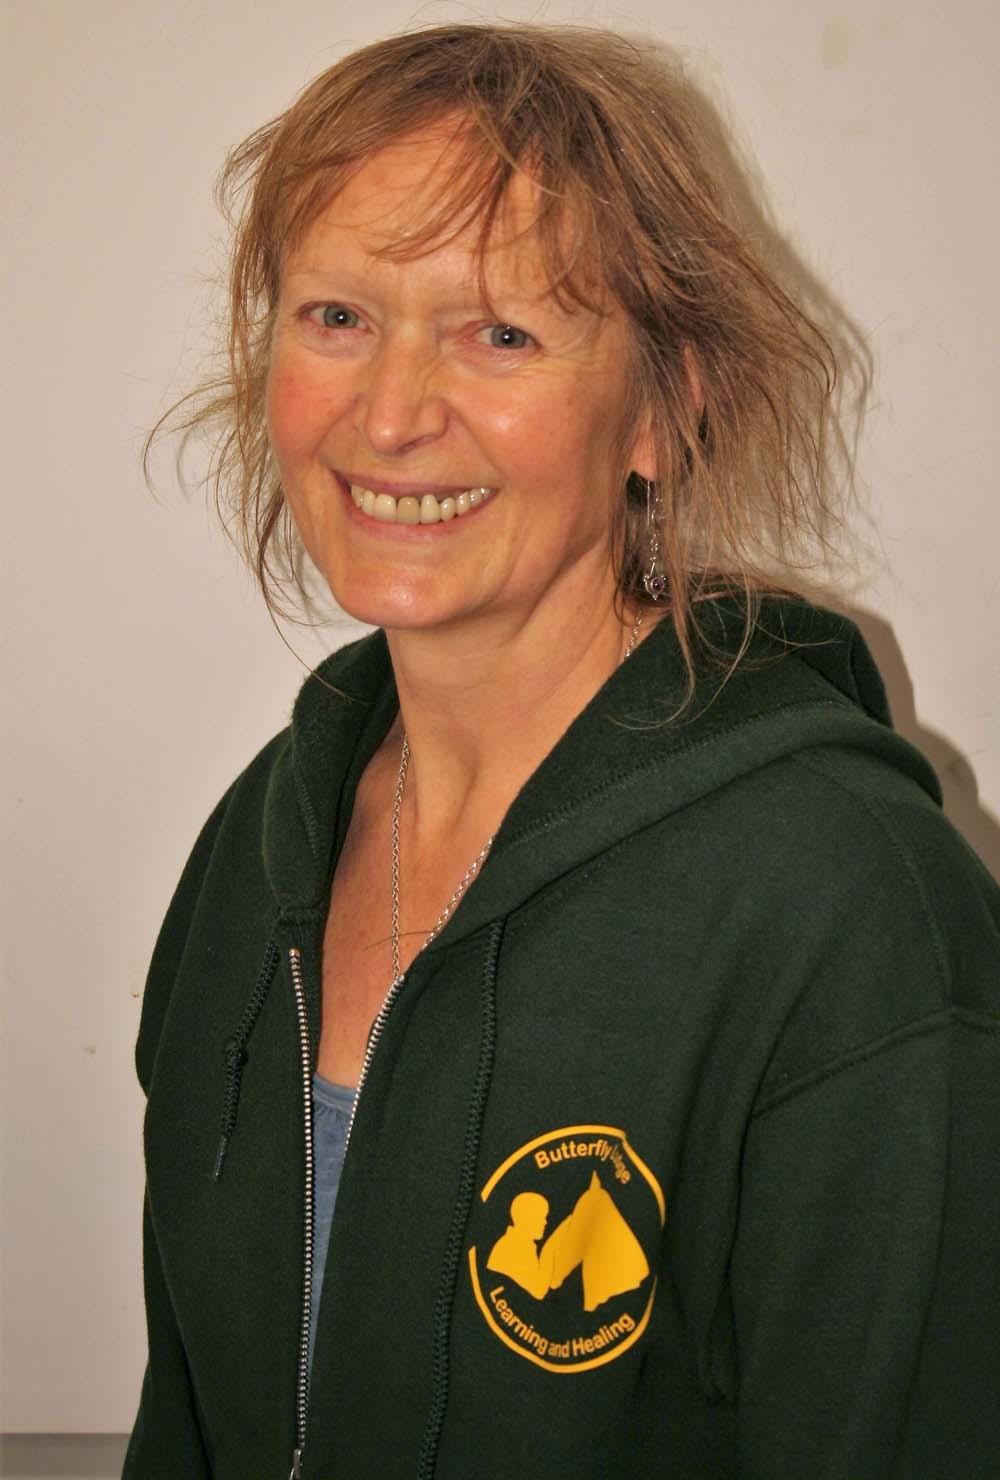 Leonie O'Loughlin